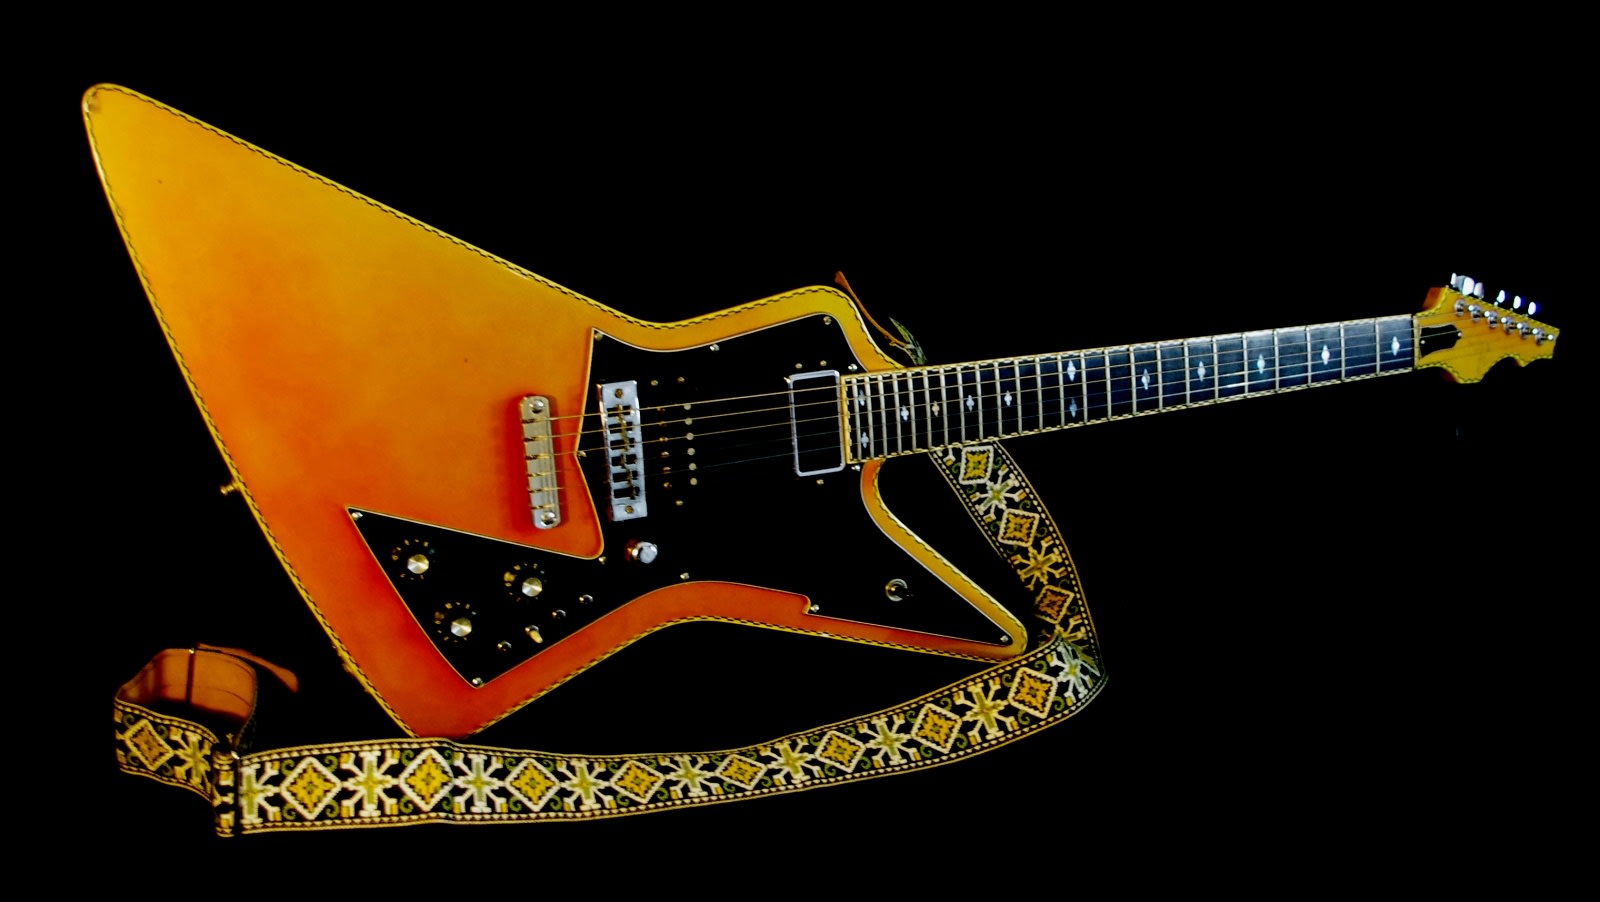 T.I.M.E. Explorer 1983 Orange Metallic.  The Coolest Guitar on the Planet.  EXTREMELY RARE EXPLORER